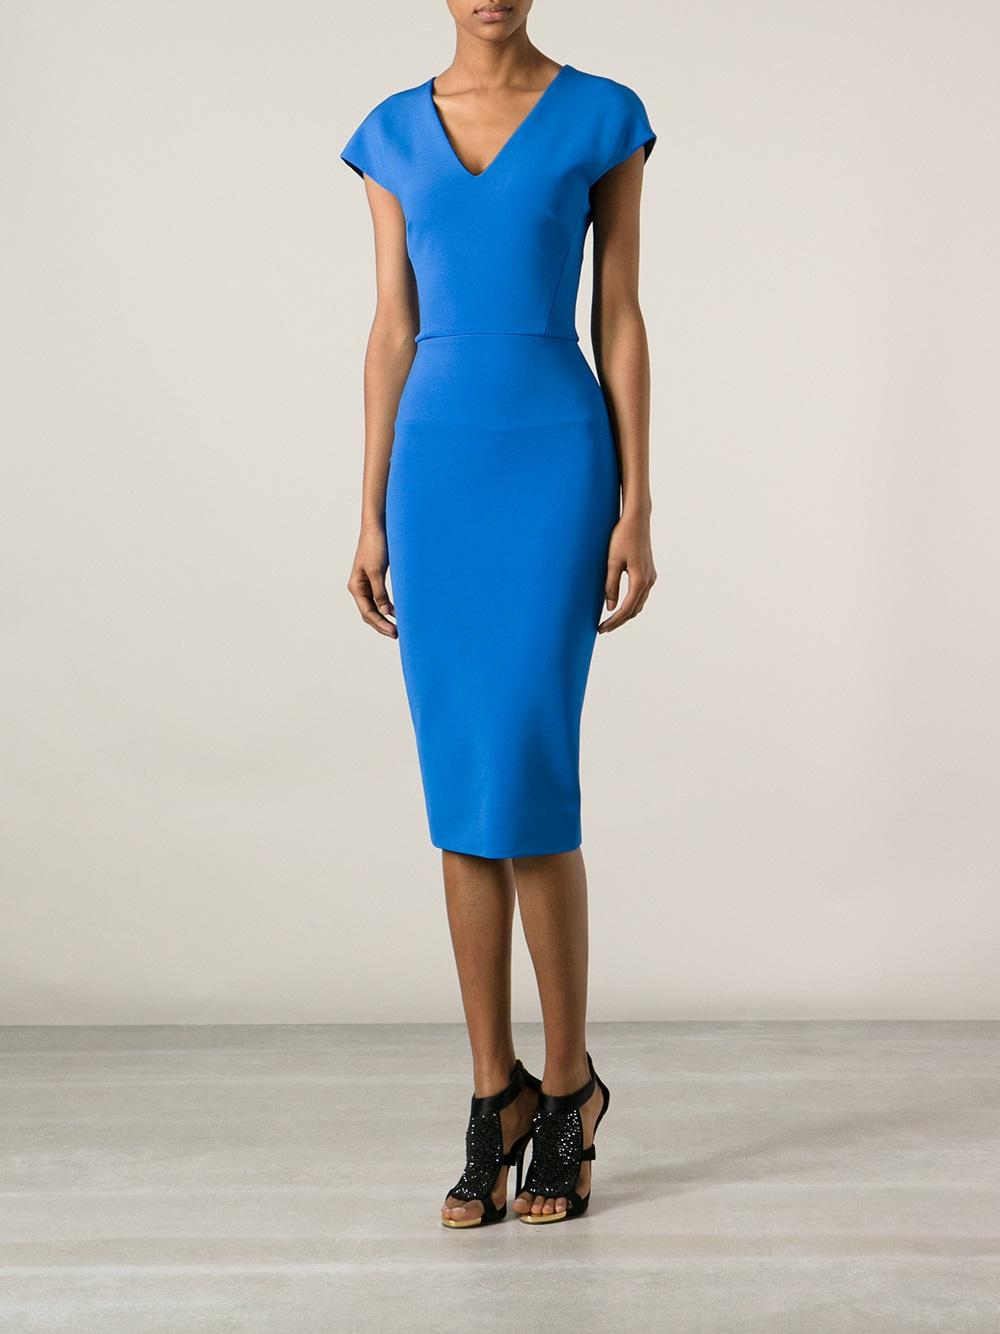 melange fitted dress - Blue Victoria Beckham NhpqBzO7n1